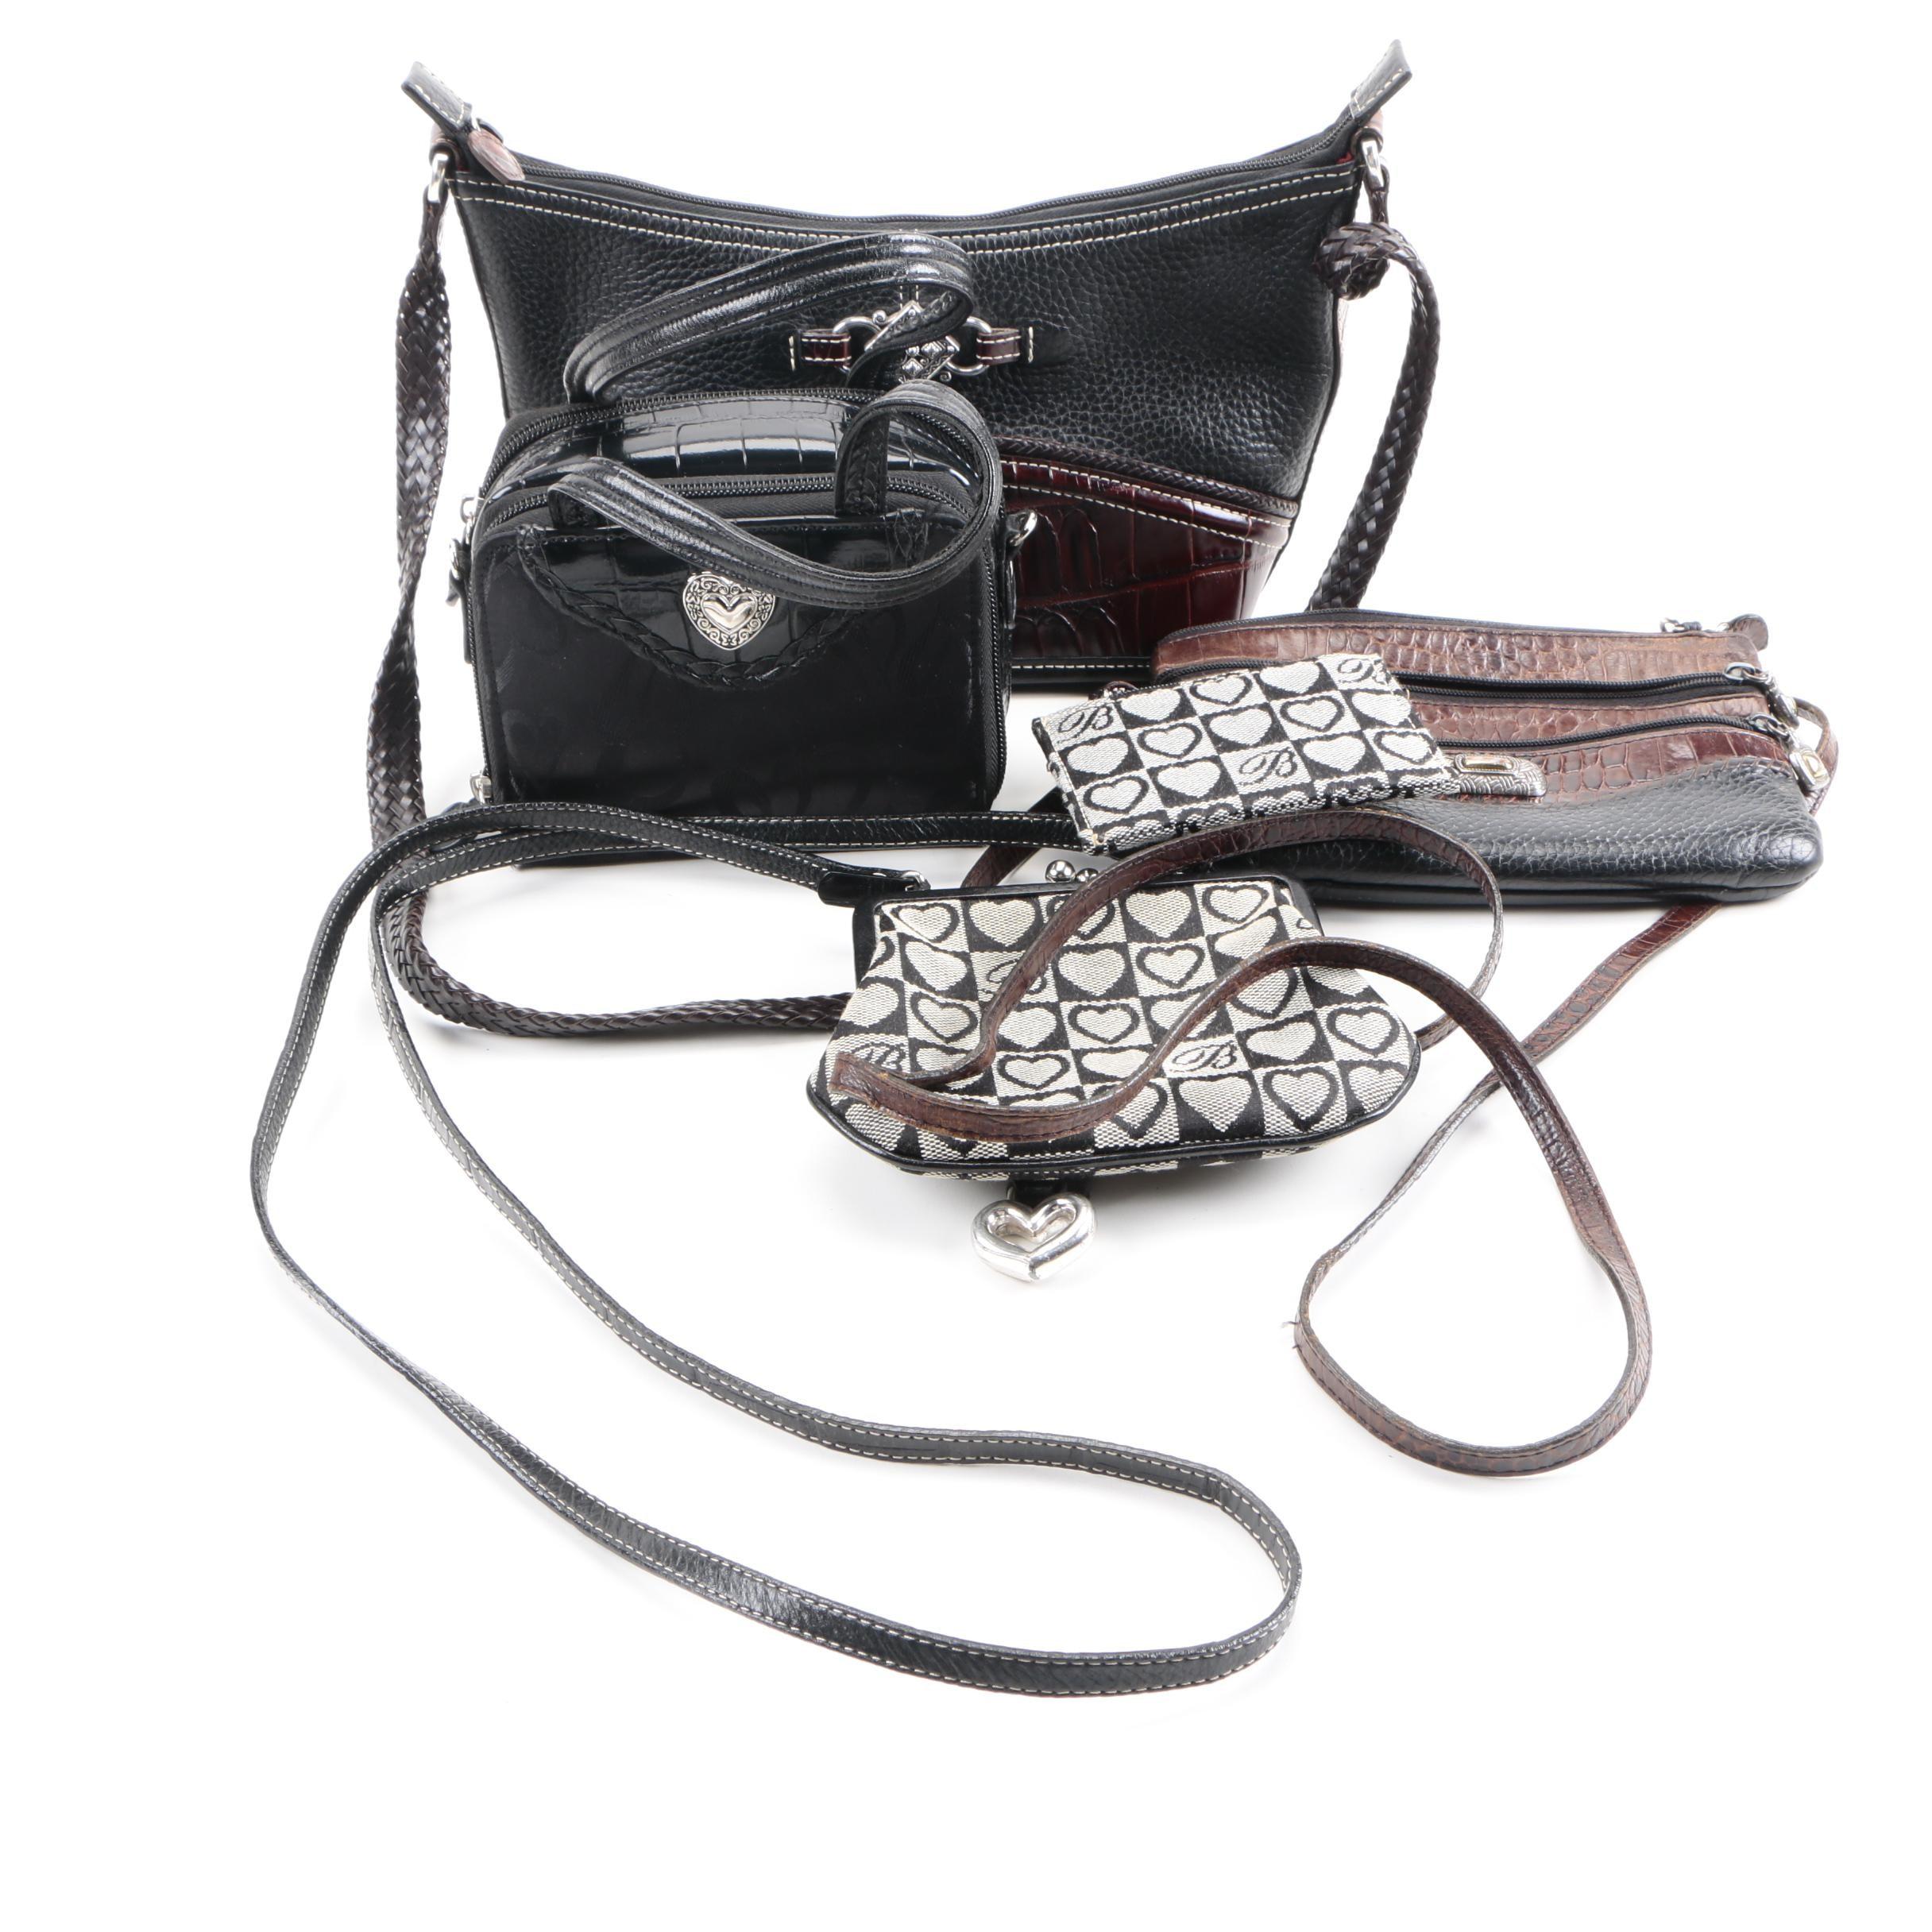 Brighton Handbags and Accessories